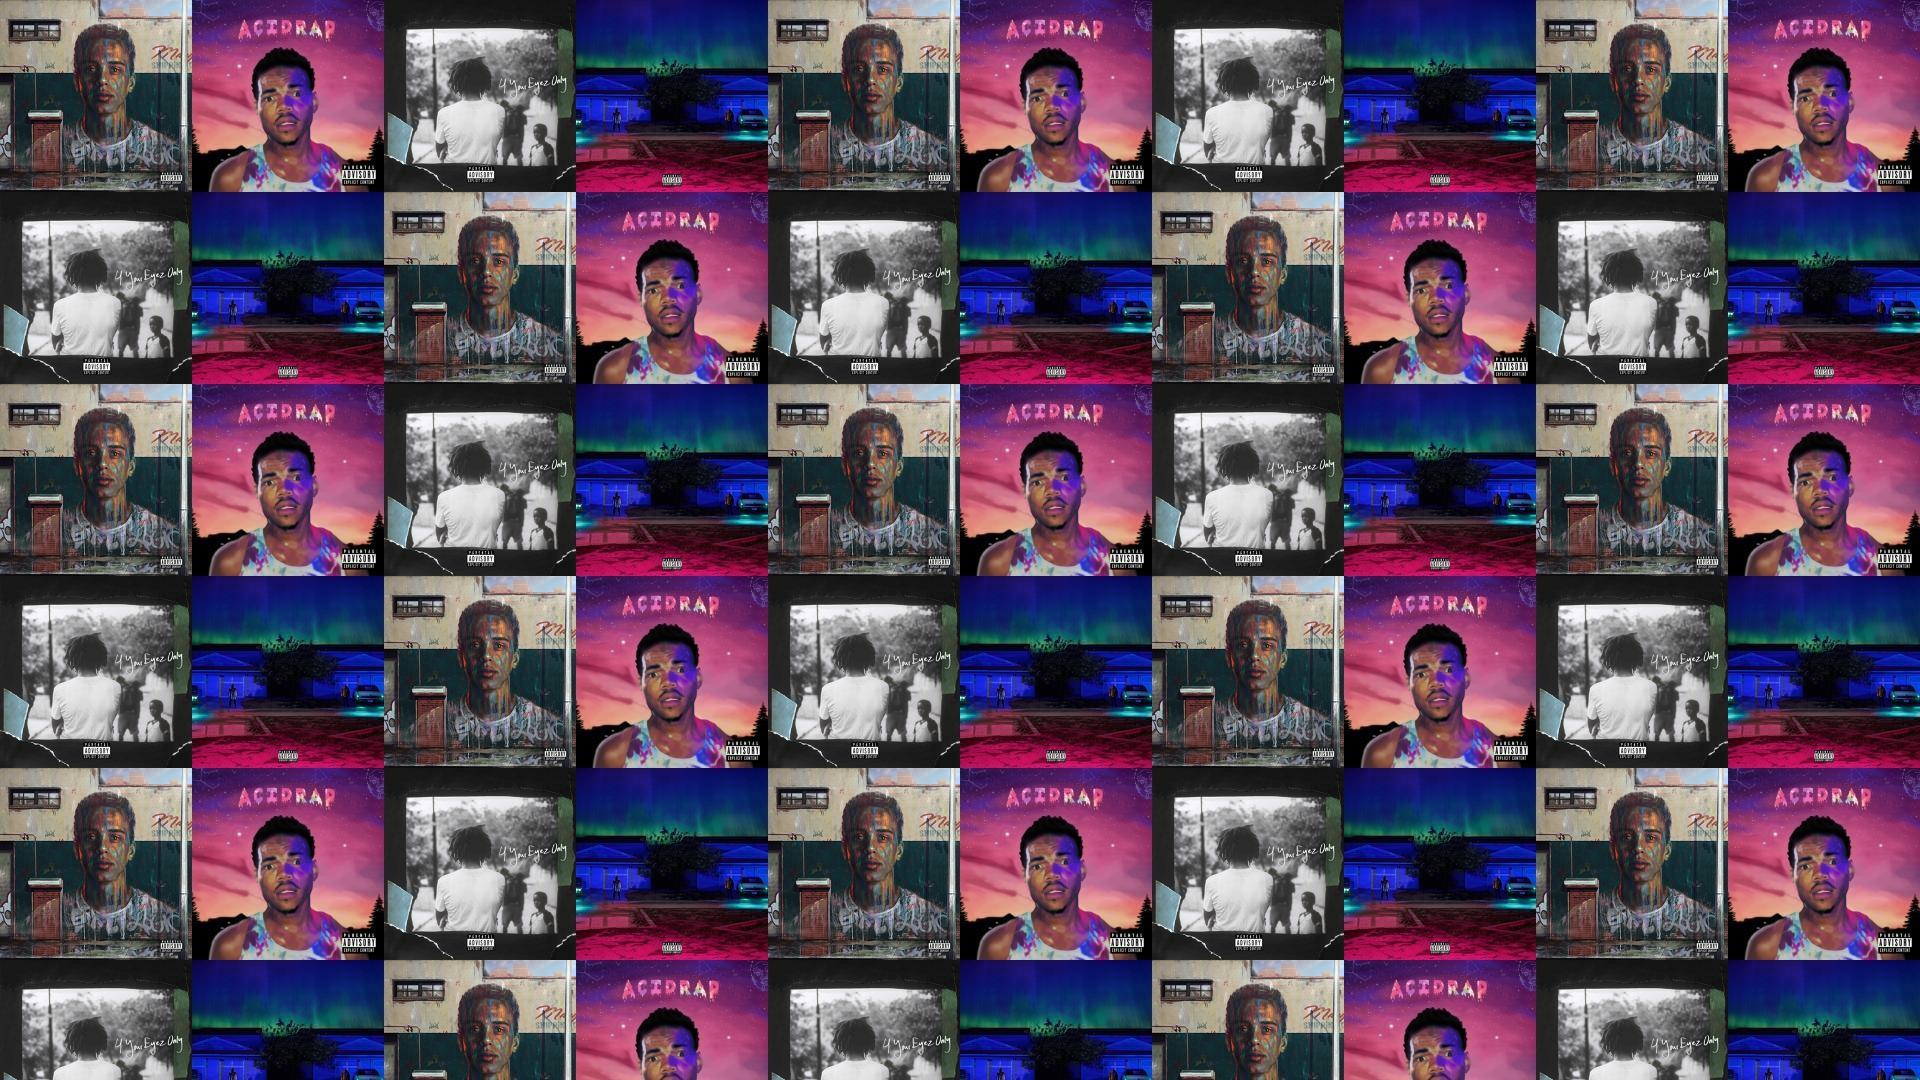 Logic Under Pressure Chance Rapper Acid Rap Wallpaper Â« Tiled Desktop  Wallpaper